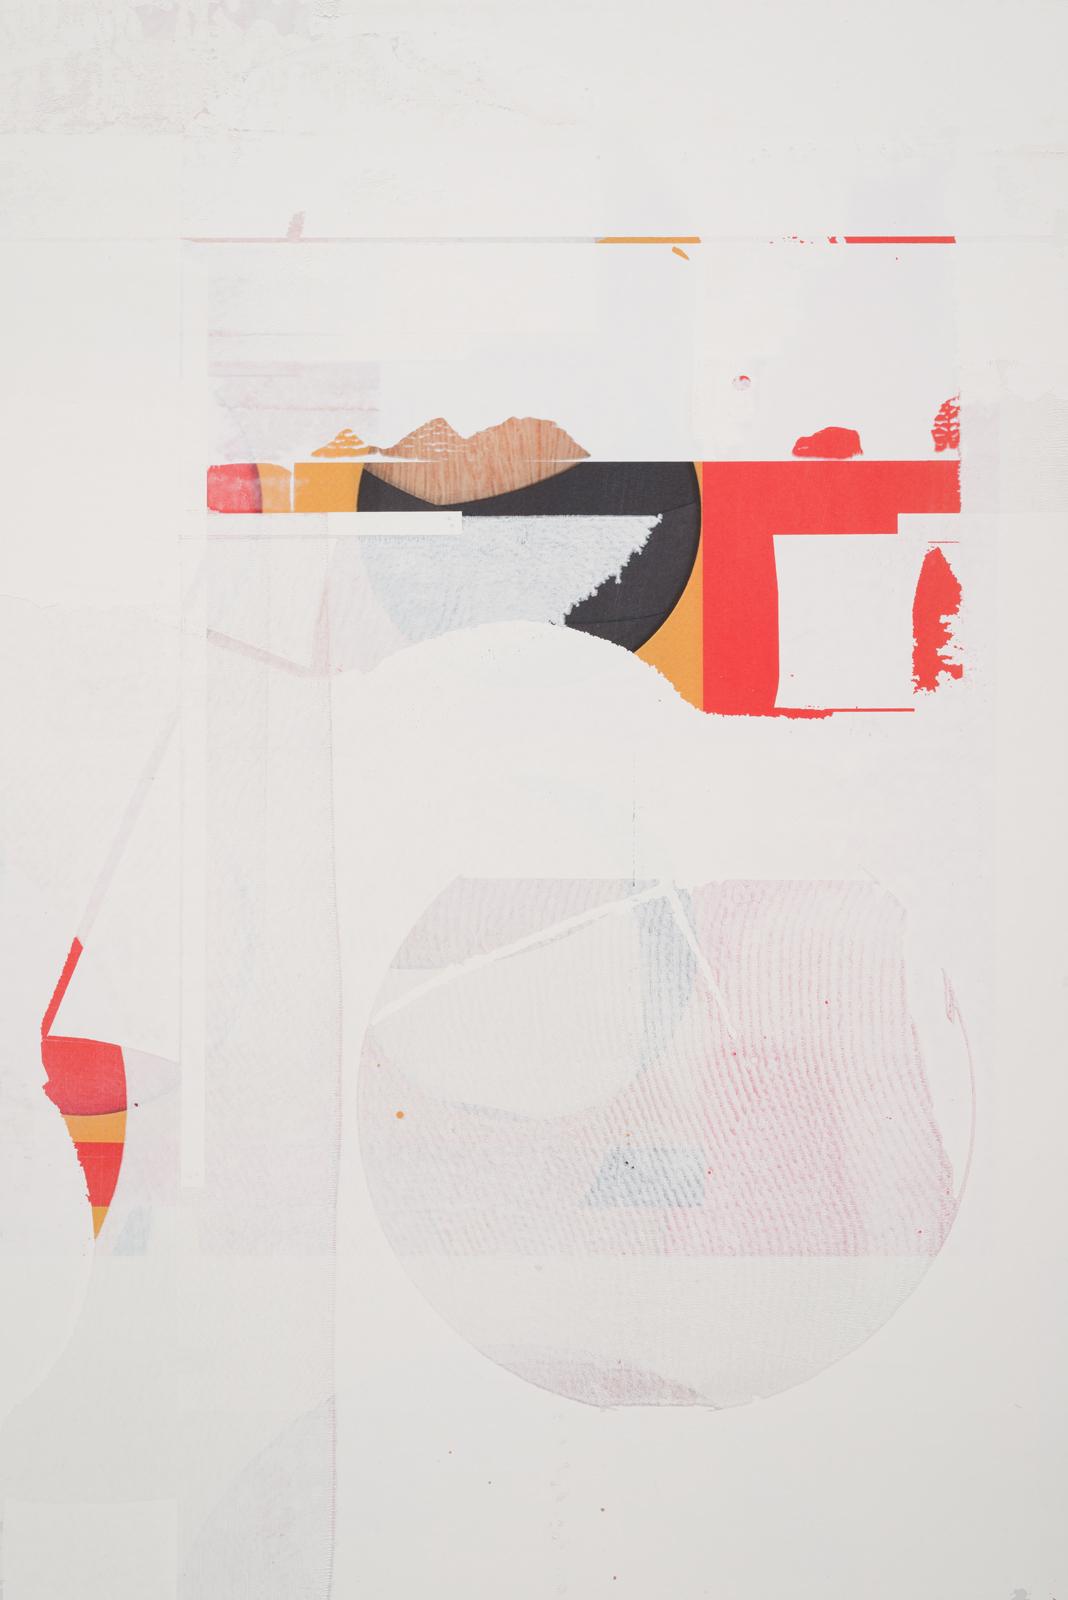 Composite 16 (hideaway), detail